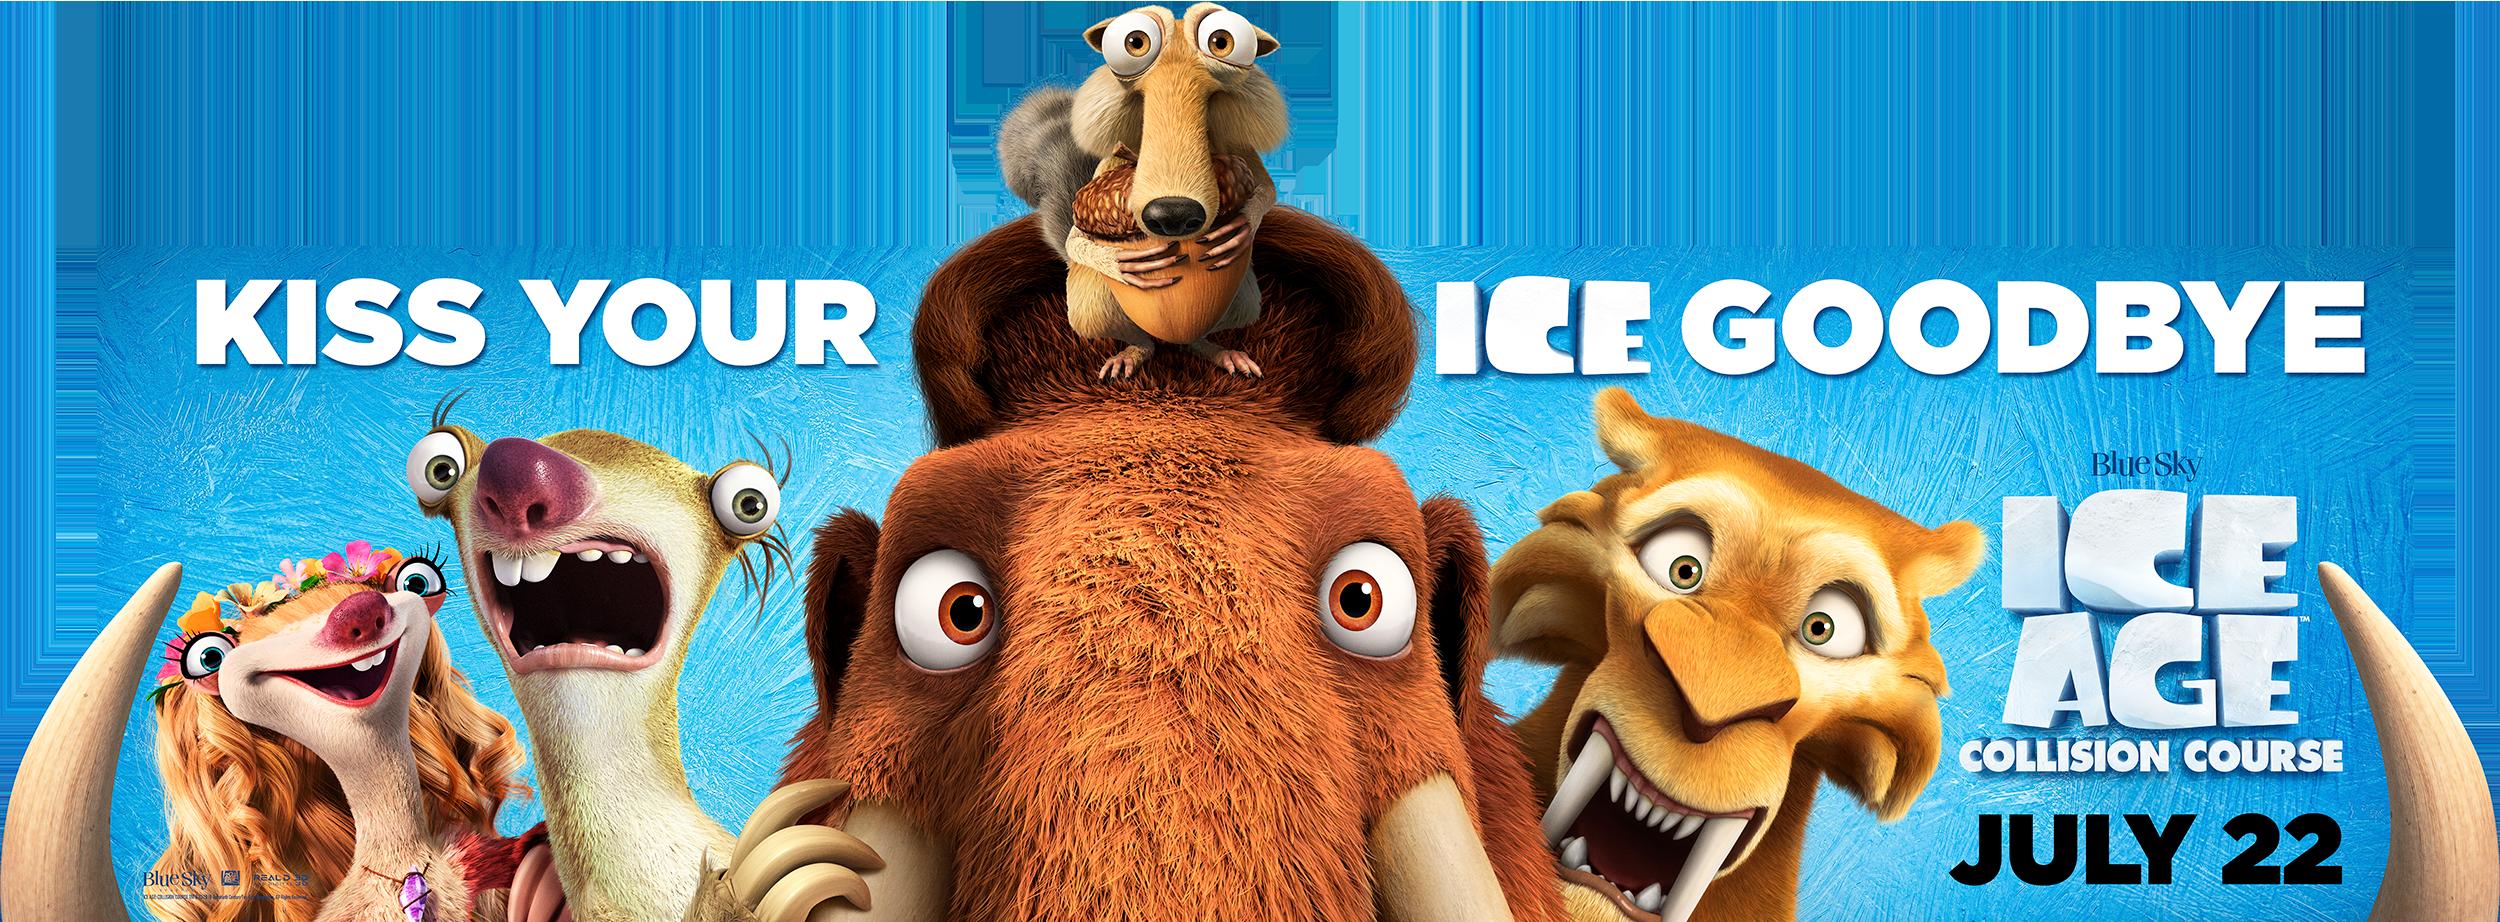 Ice Age: Collision Course | Billboard Finishing & Illustration